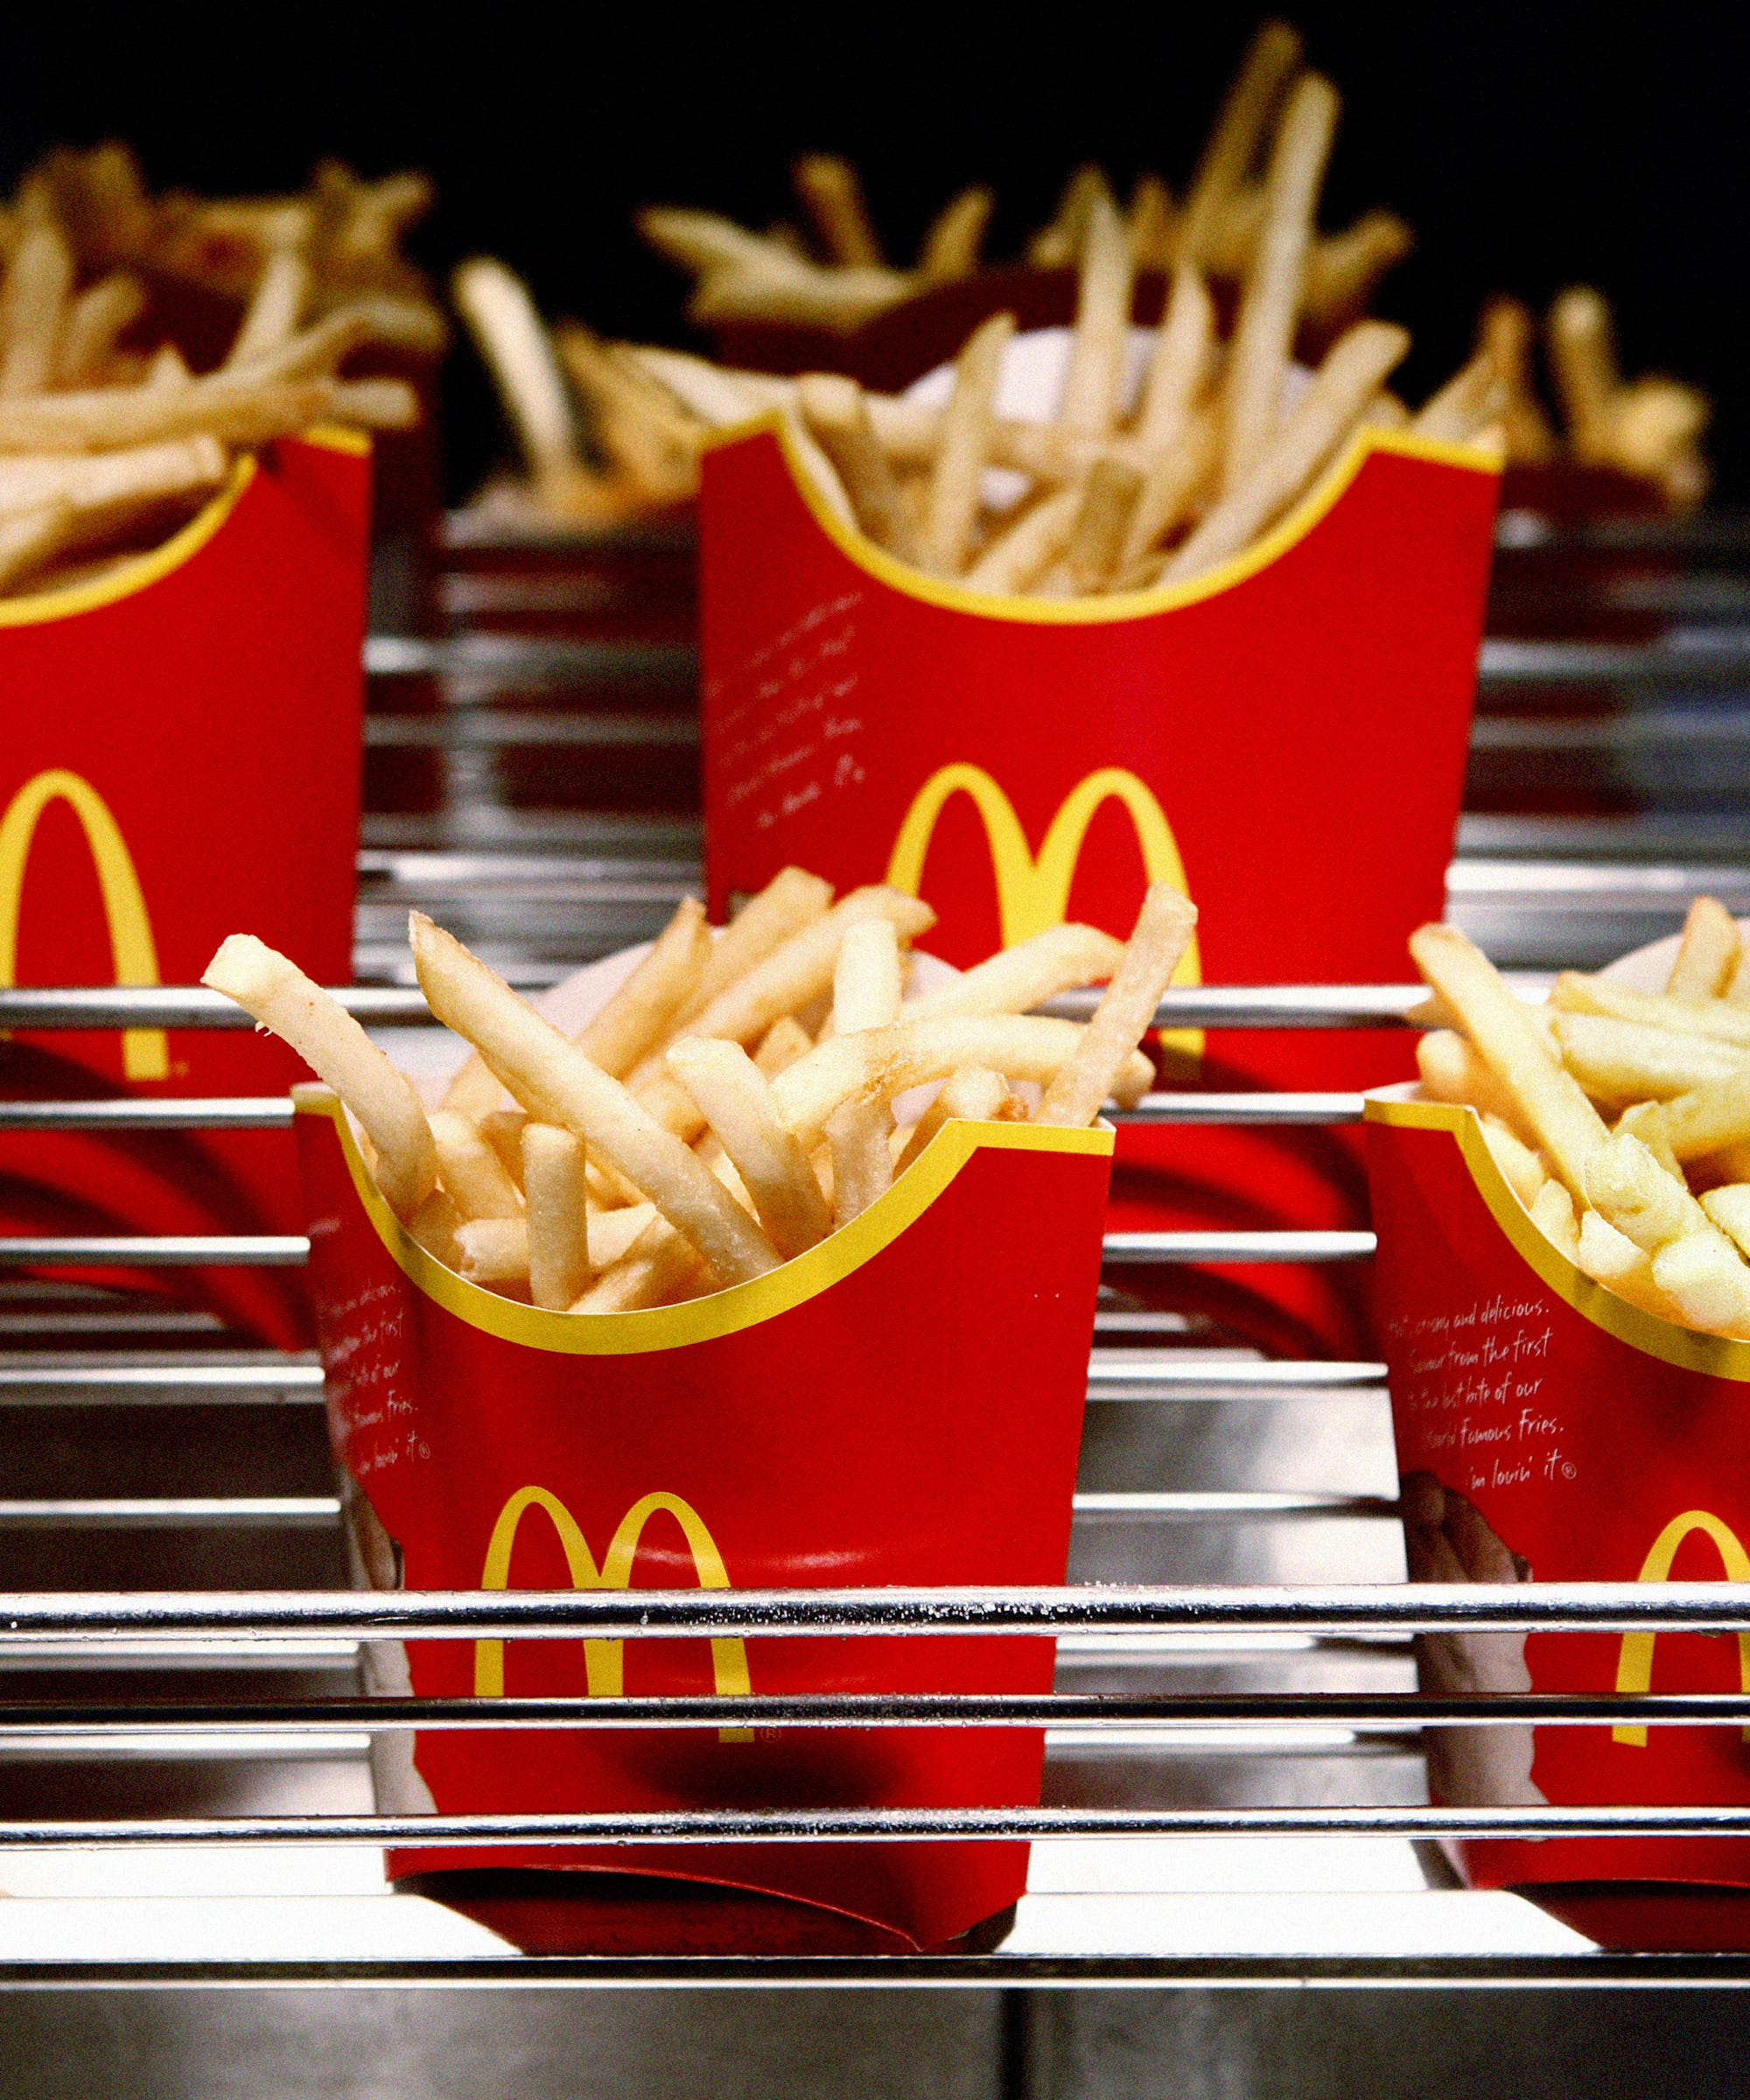 Fullsize Of Mcdonalds Rainbow Fries